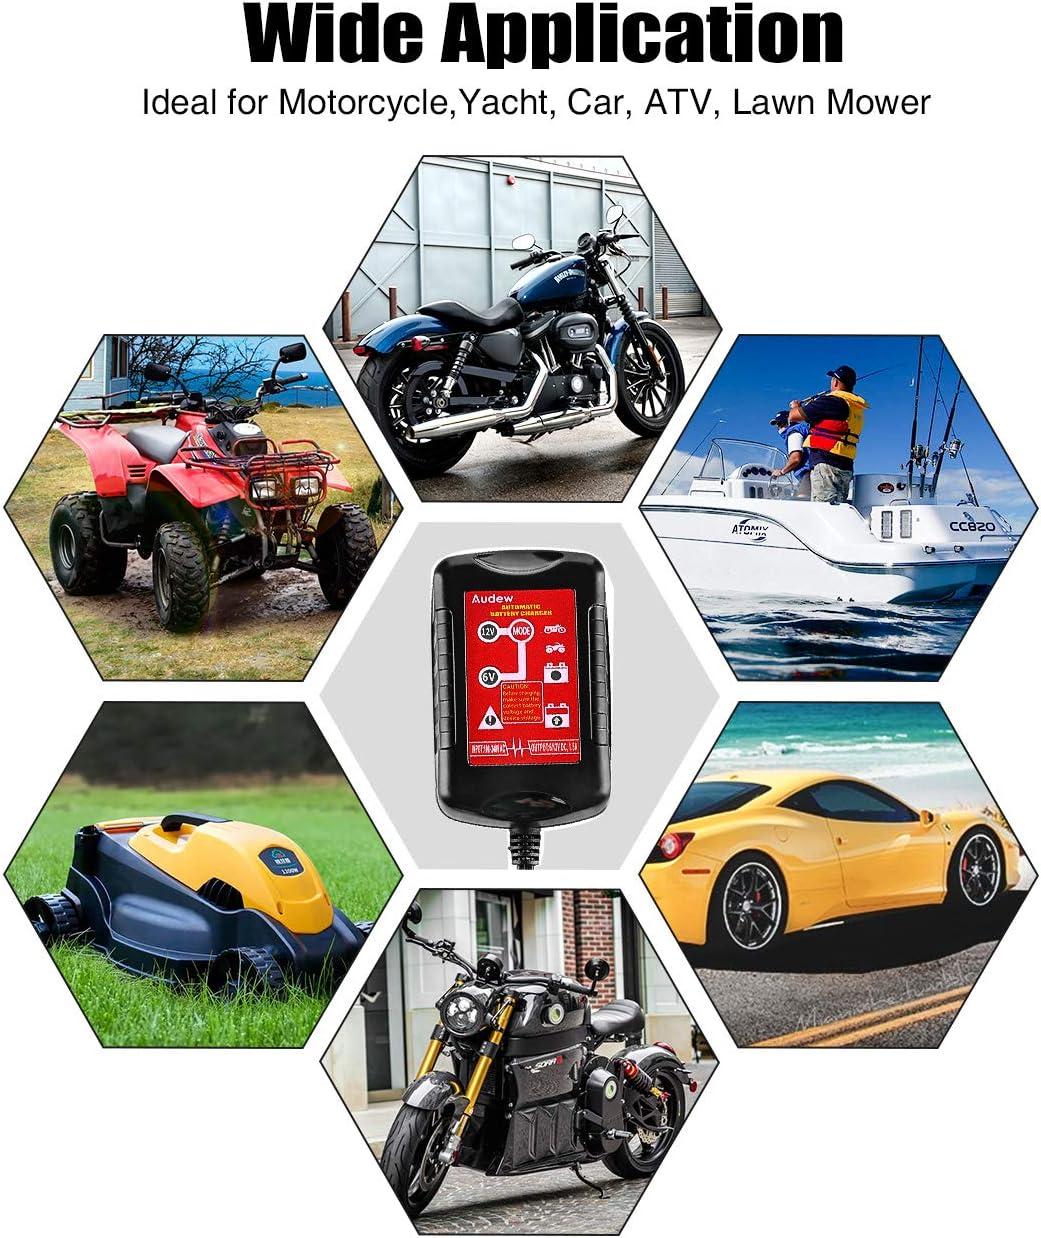 Moto ATV 6V//12V 1.5Amp Camper Audew Caricabatteria e Mantenitore di Carica Intelligente Batteria Caricabatteria per Auto